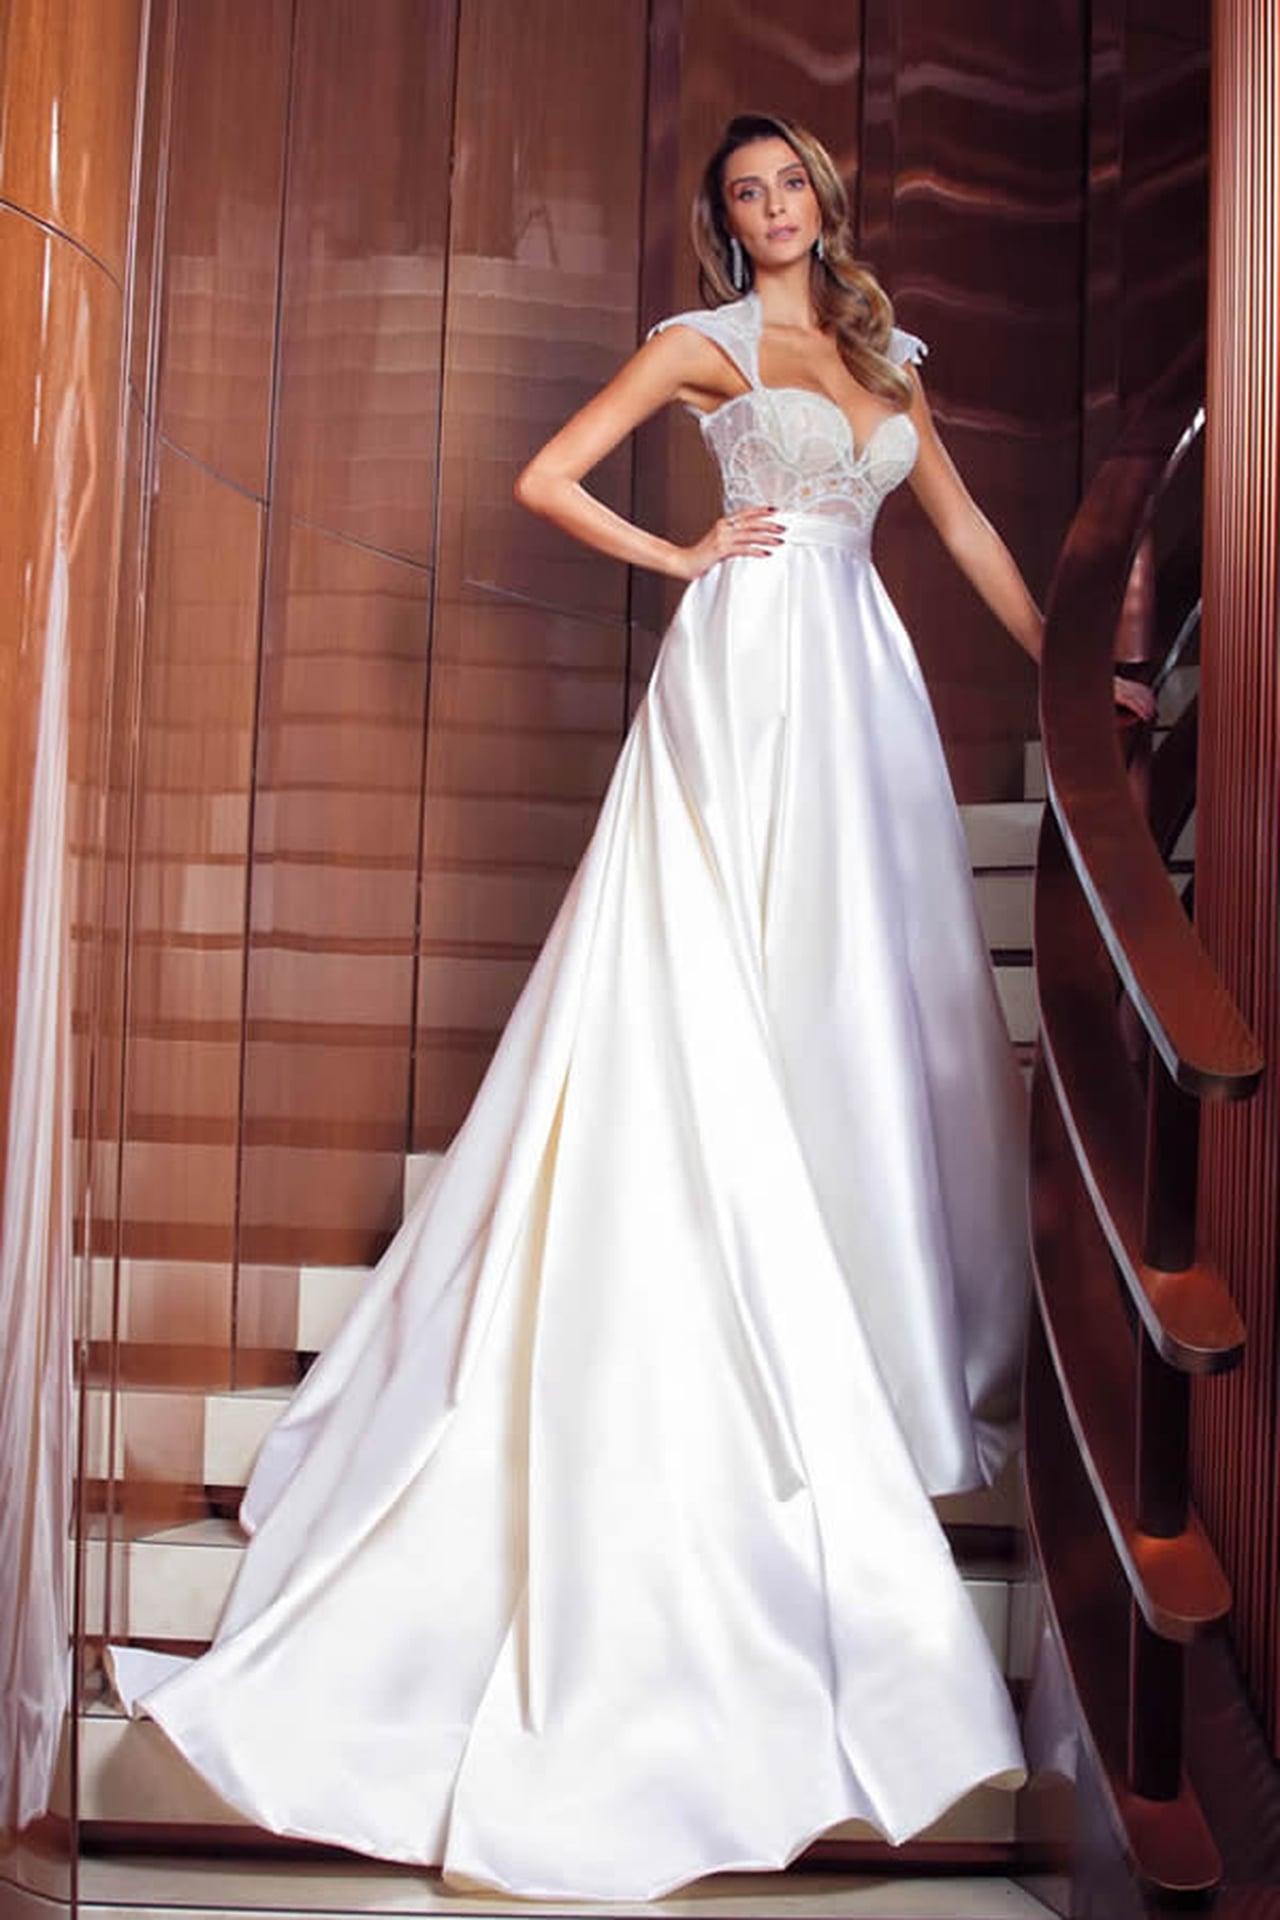 بالصور فساتين افراح , تالقي بفستان زفافك 1382 10